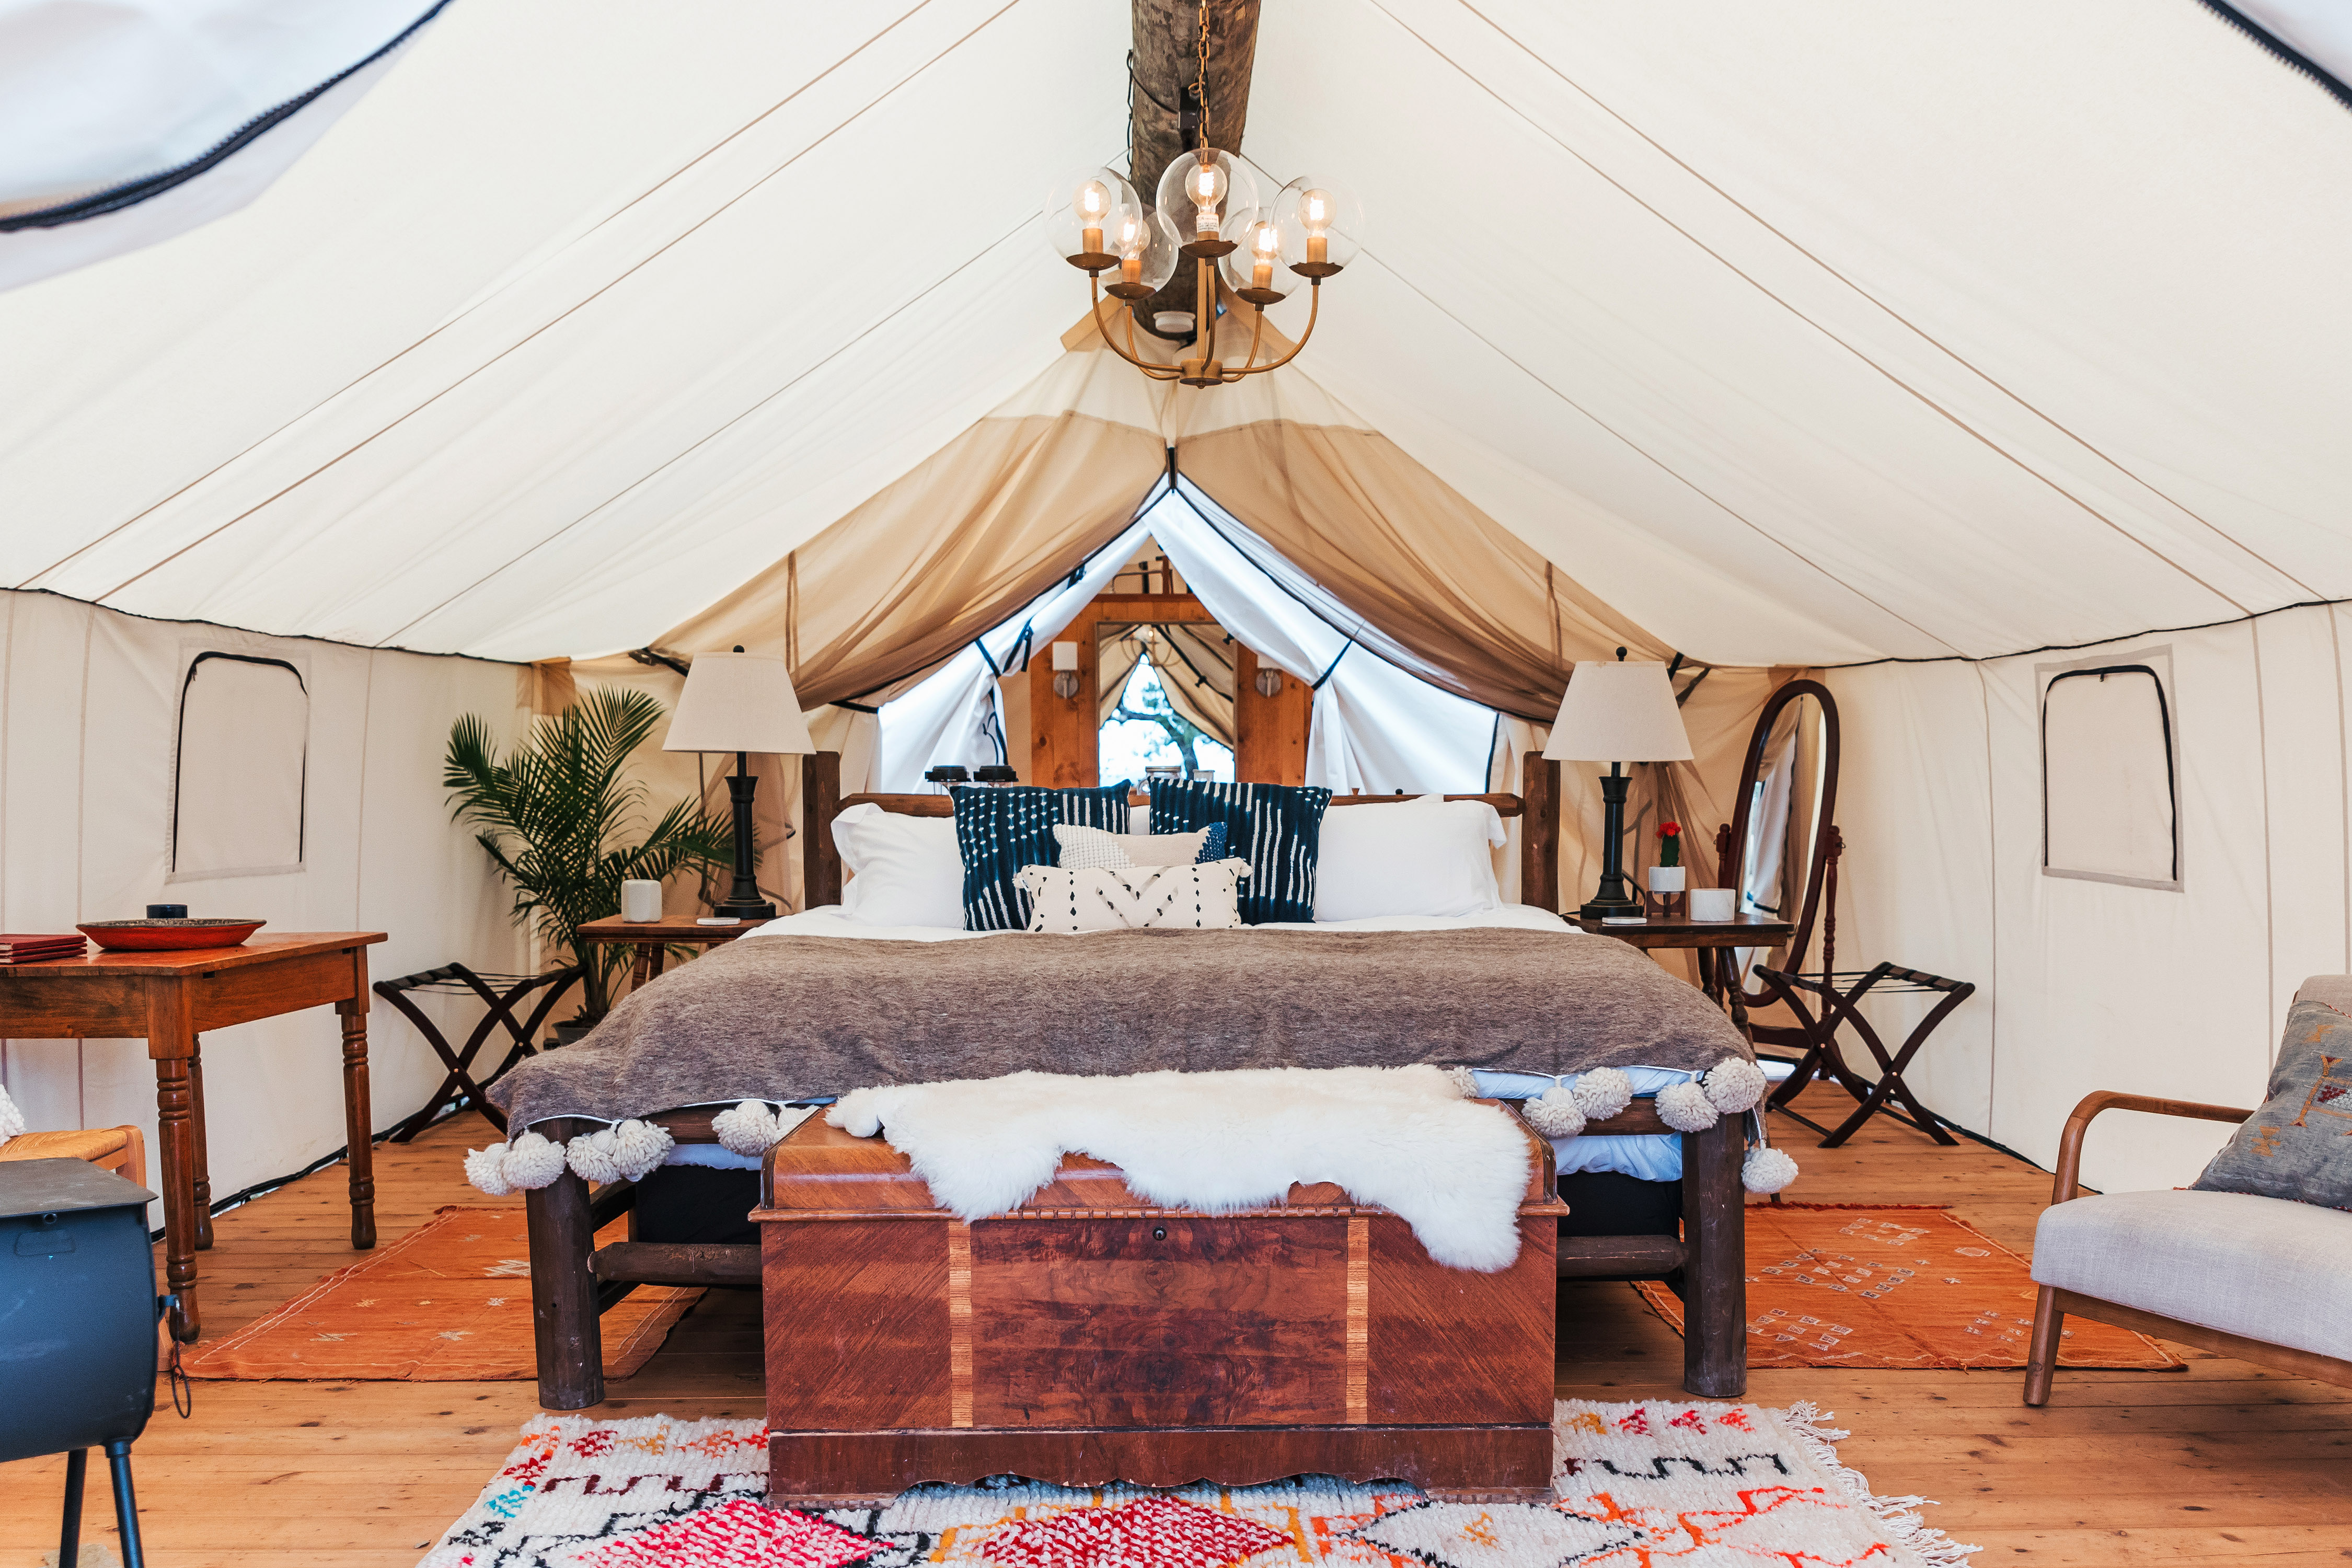 dude ranch honeymoon collective retreats tent bed interior